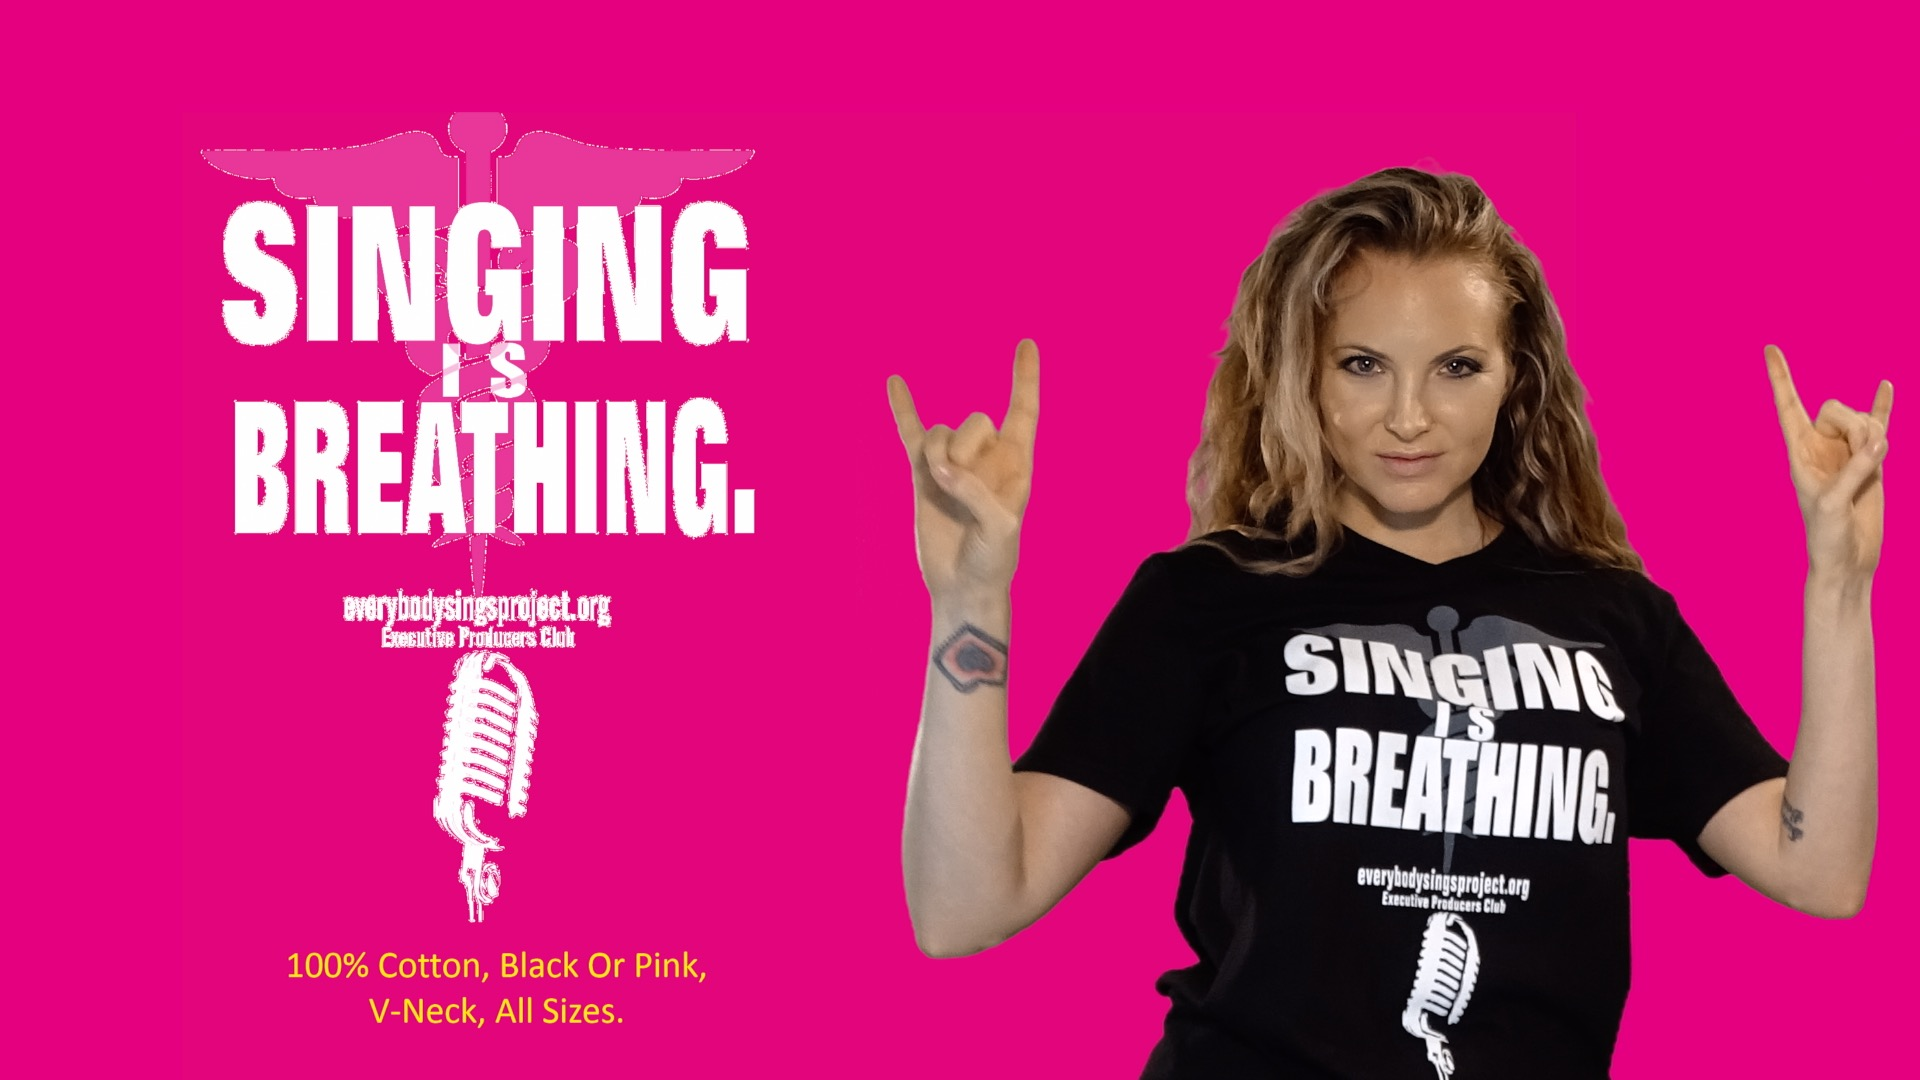 Singing is Breathing T-Shirt Sale Pink